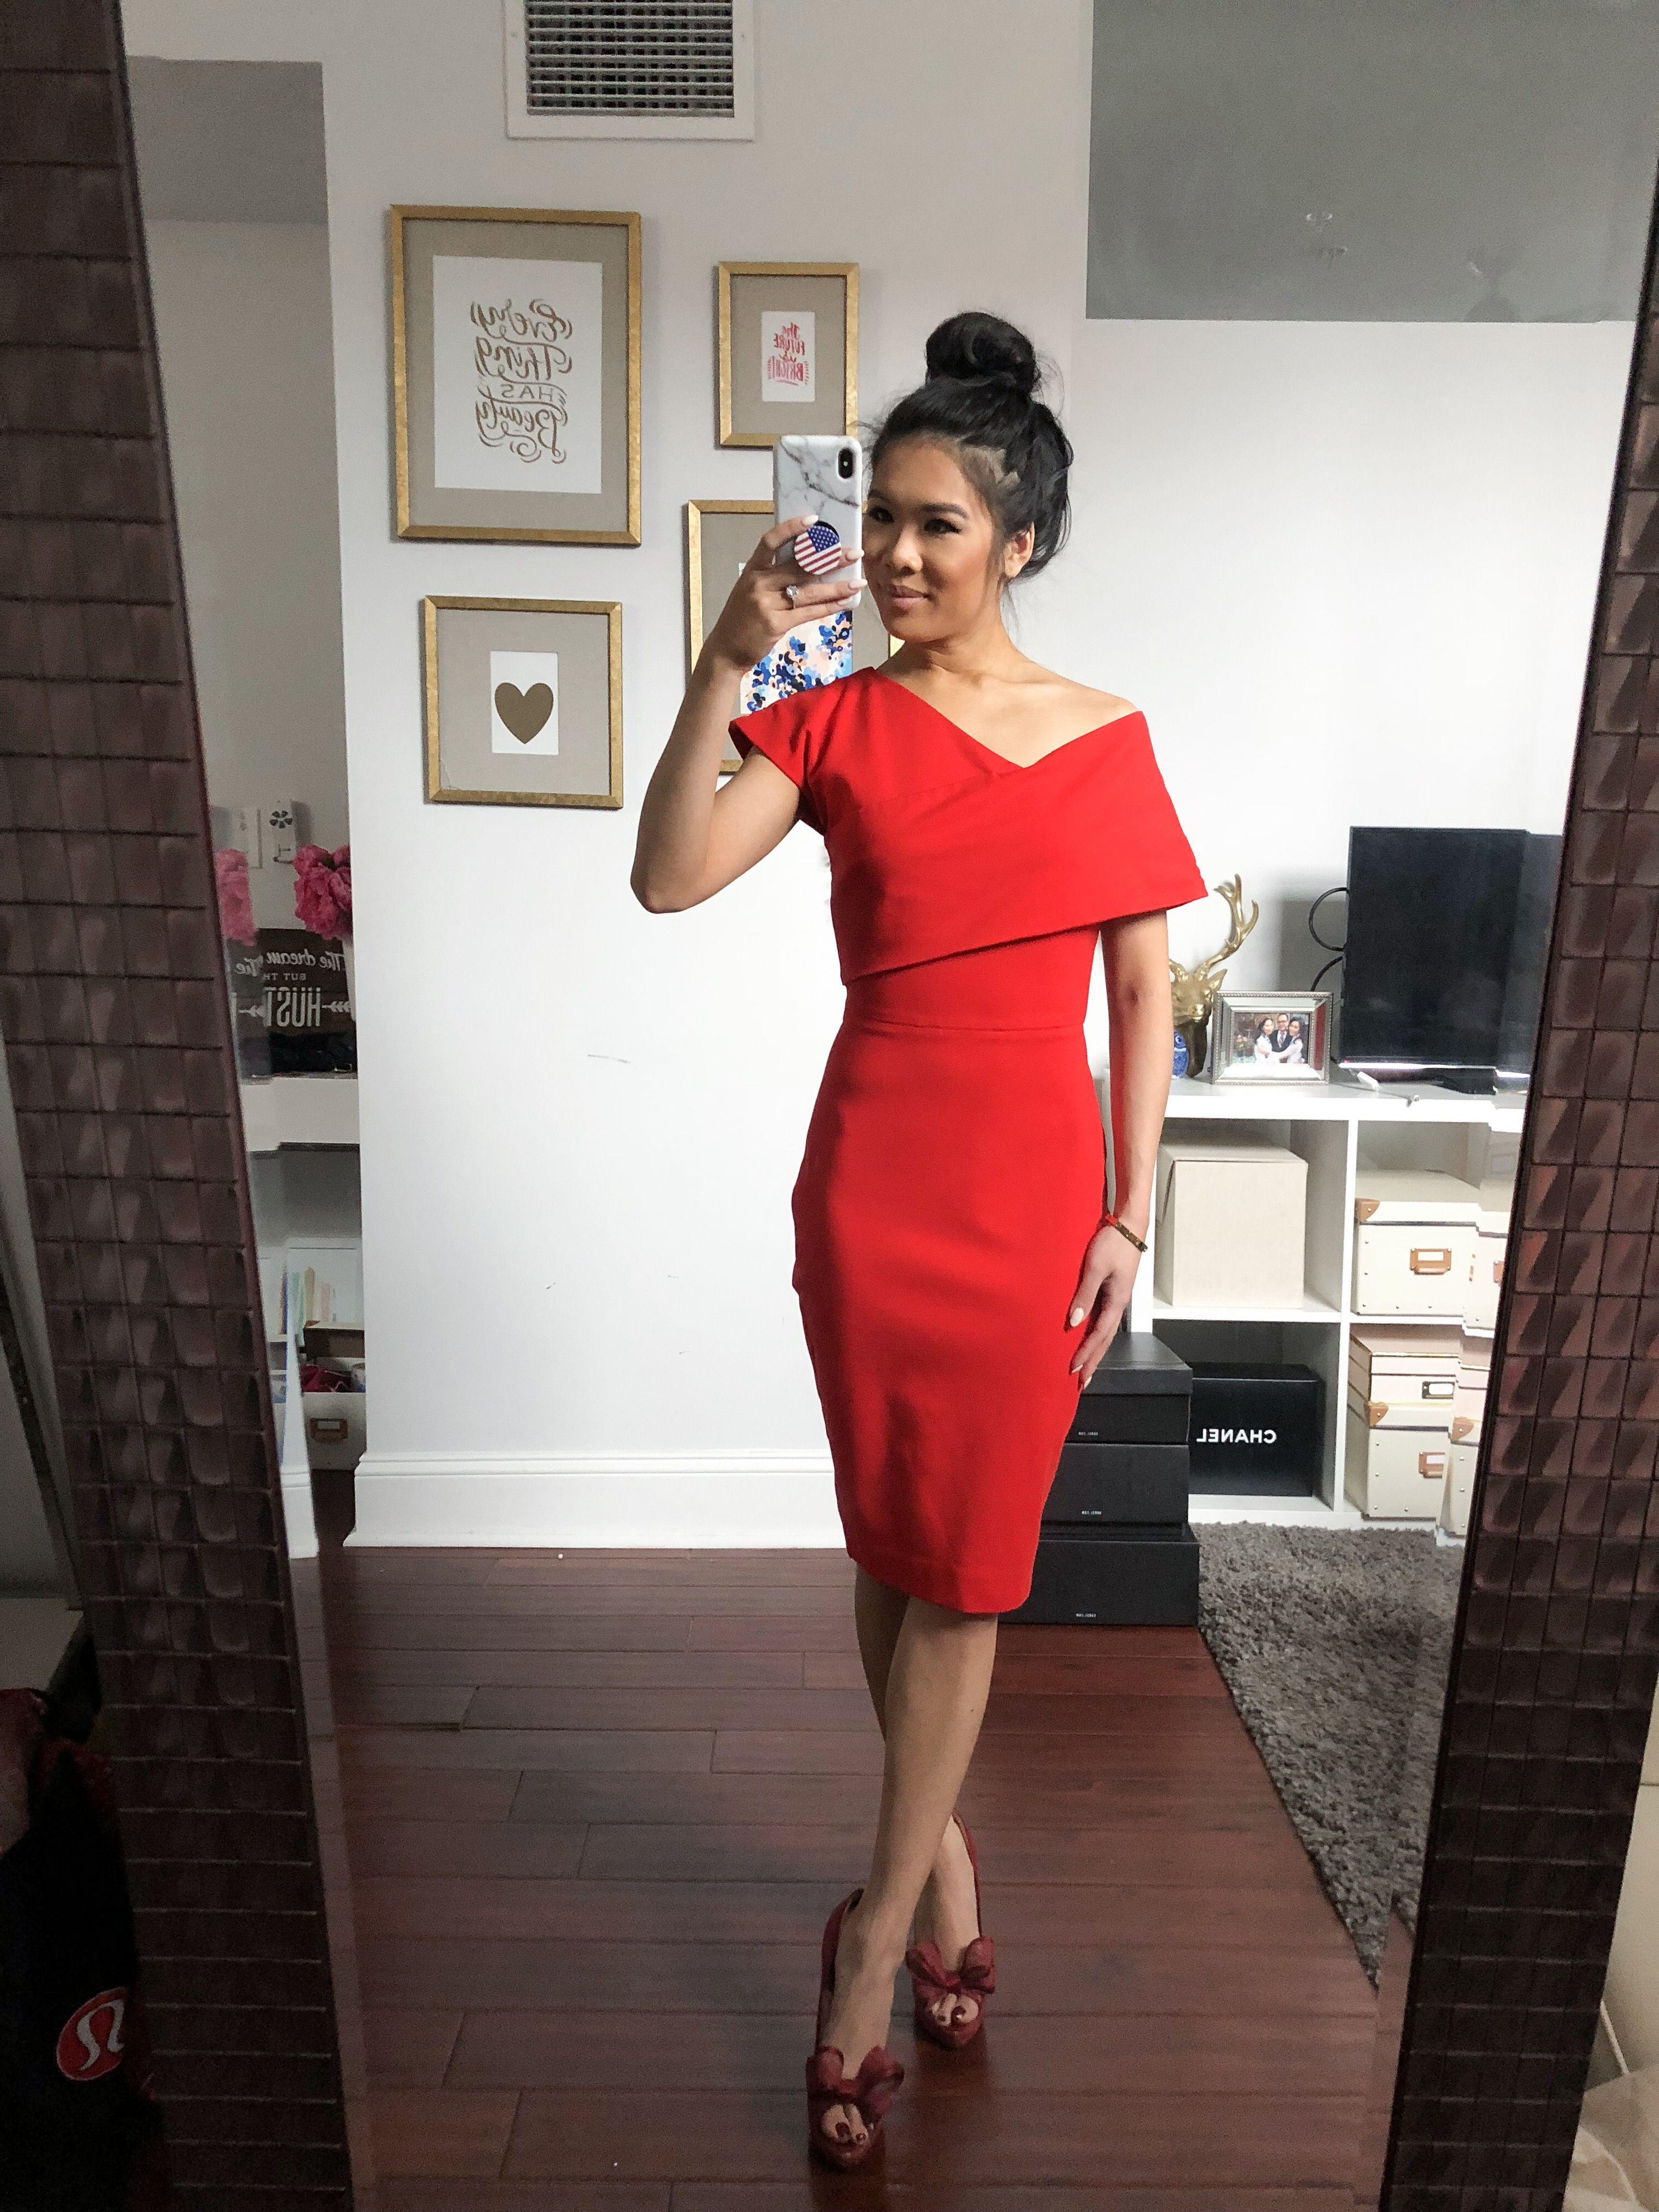 Elliatt popover emulate dress for valentineus day roupa mulher